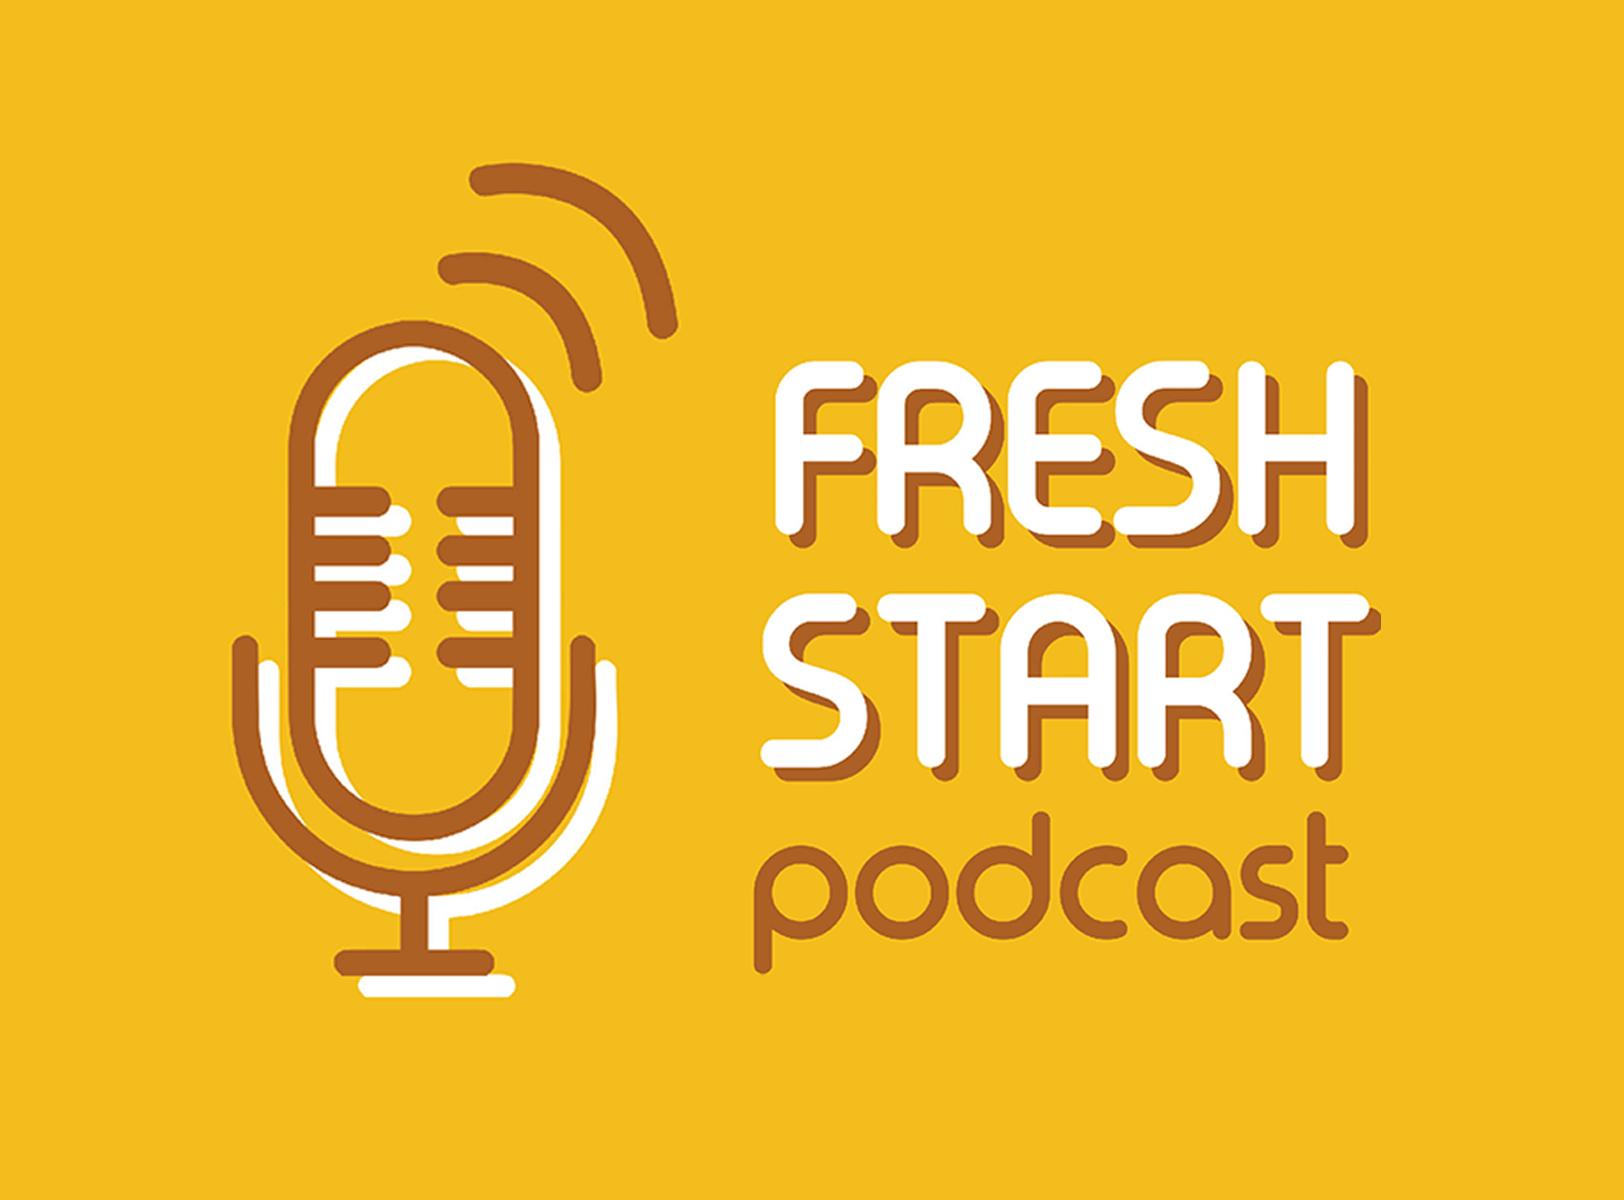 Fresh Start: Podcast News (5/18/2020 Mon.)